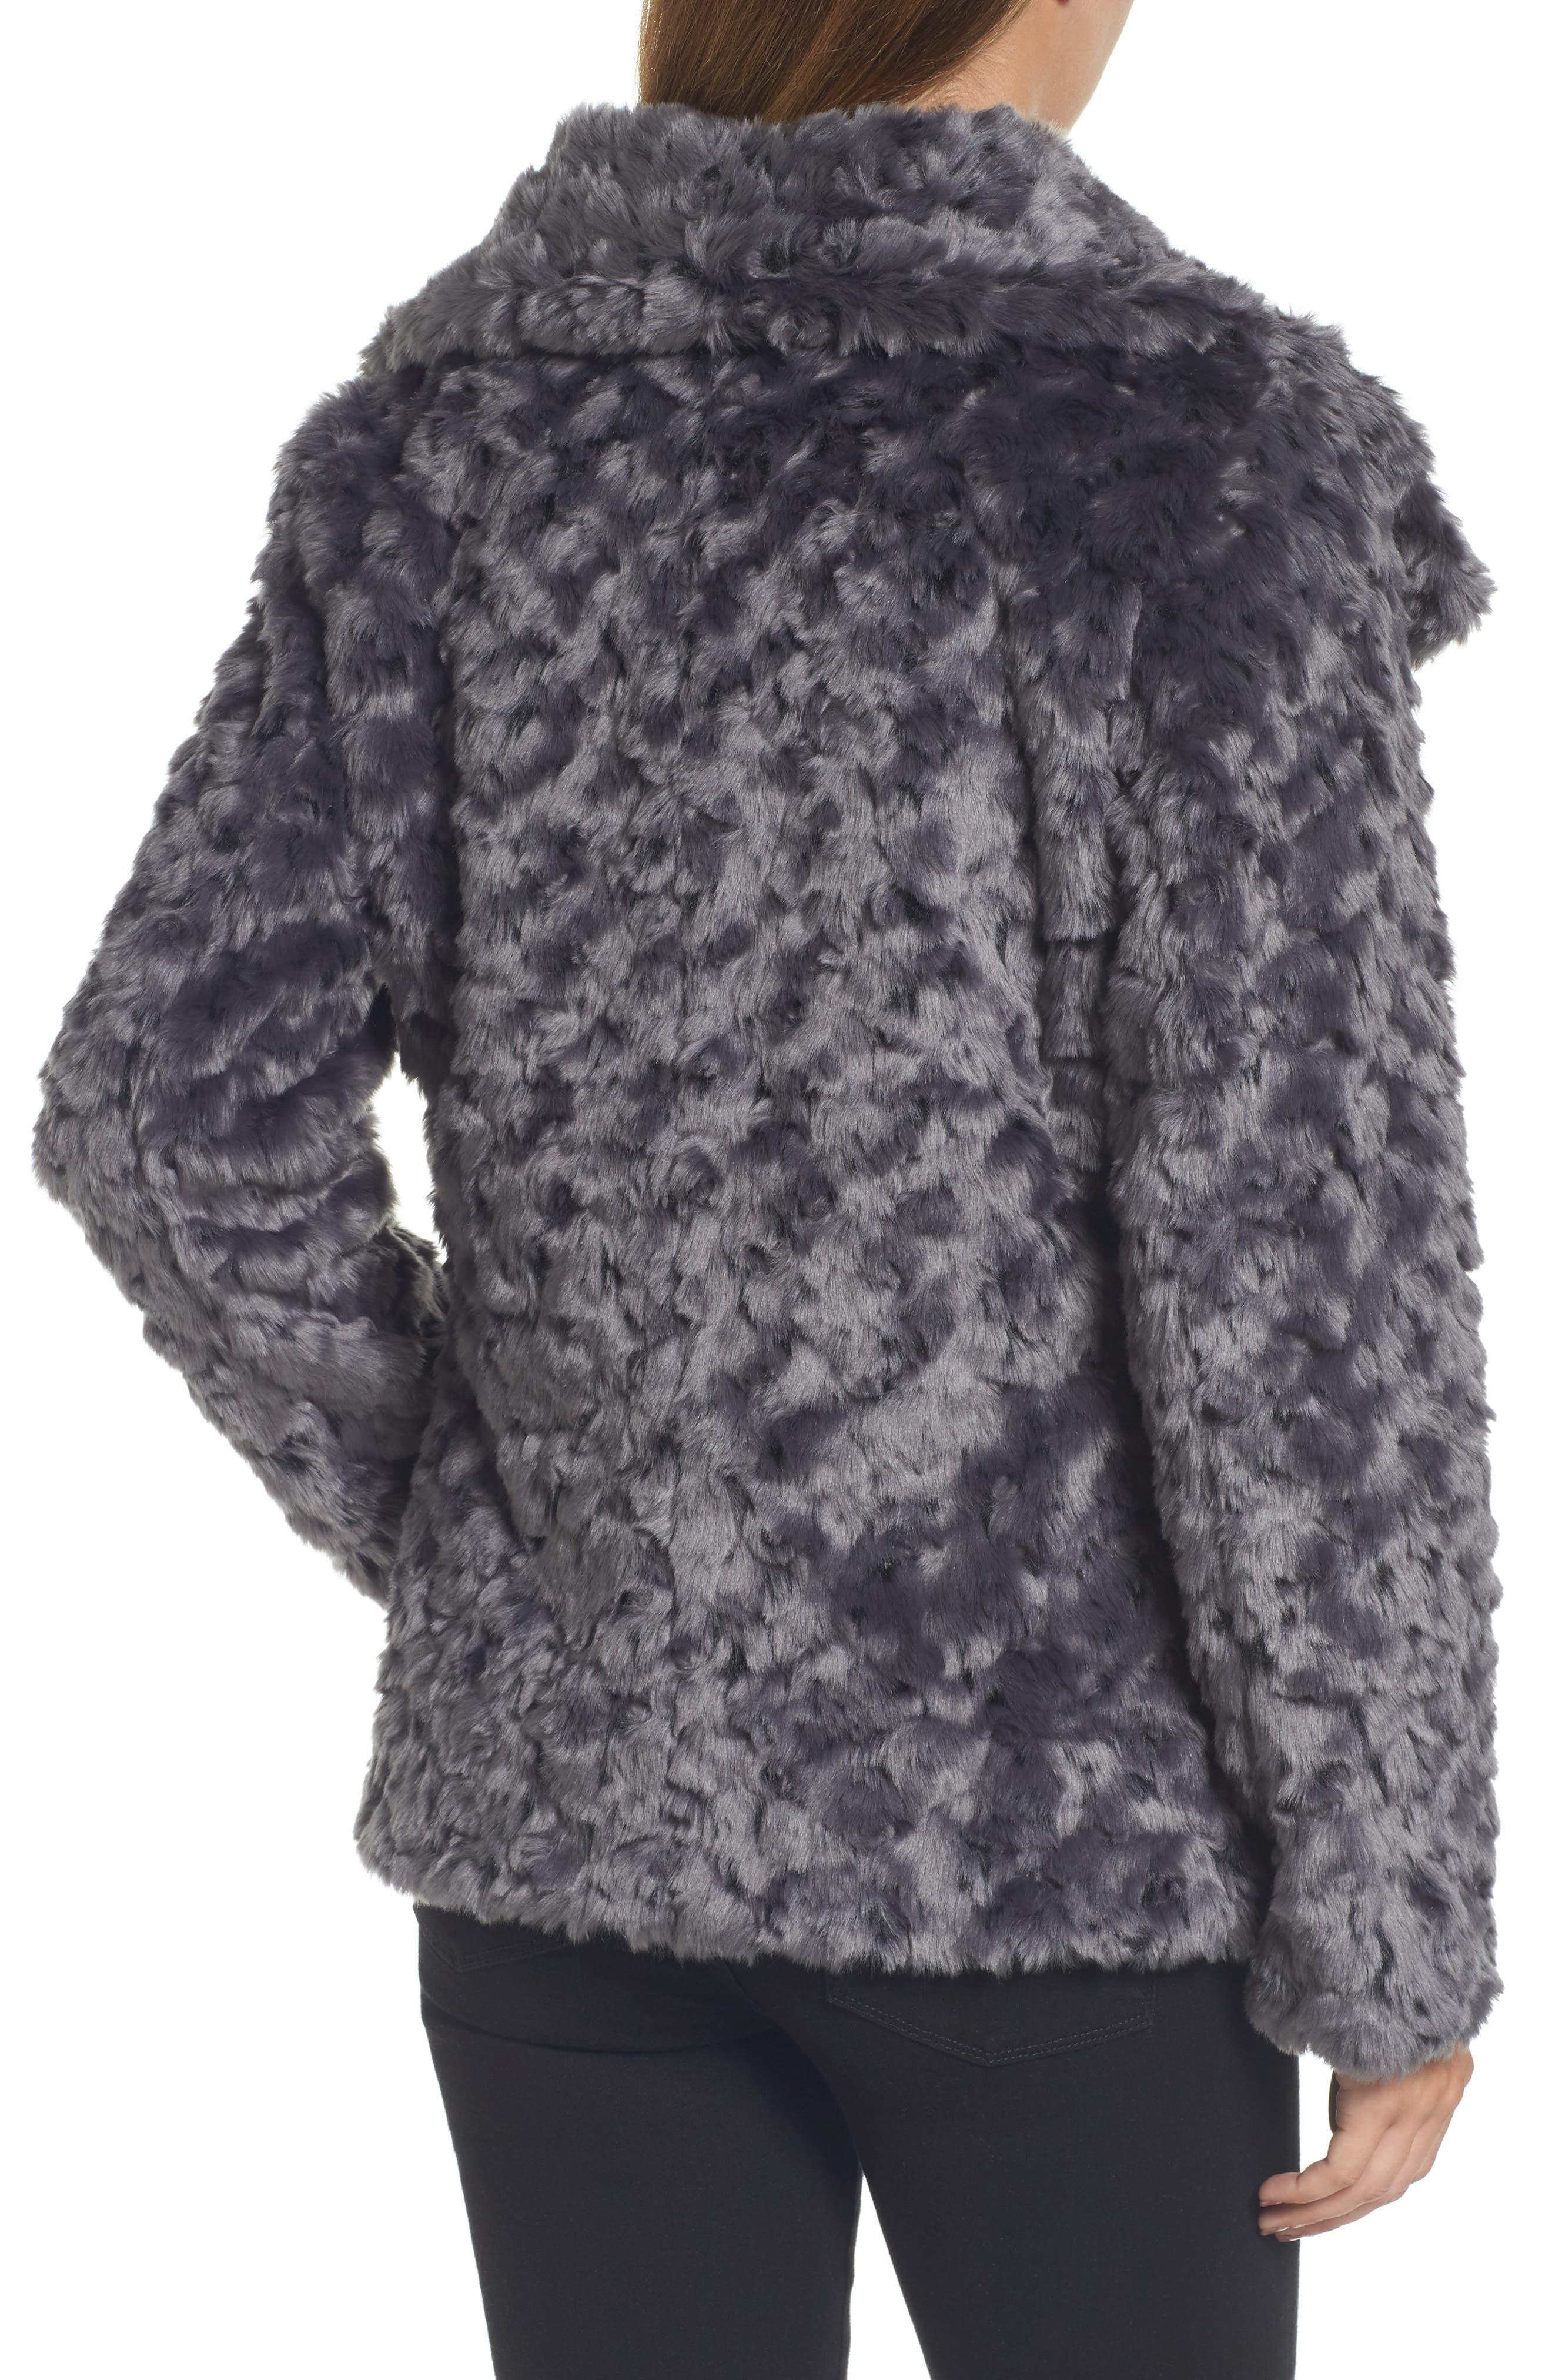 Roslyn Faux Fur Jacket,                             Alternate thumbnail 2, color,                             French Grey